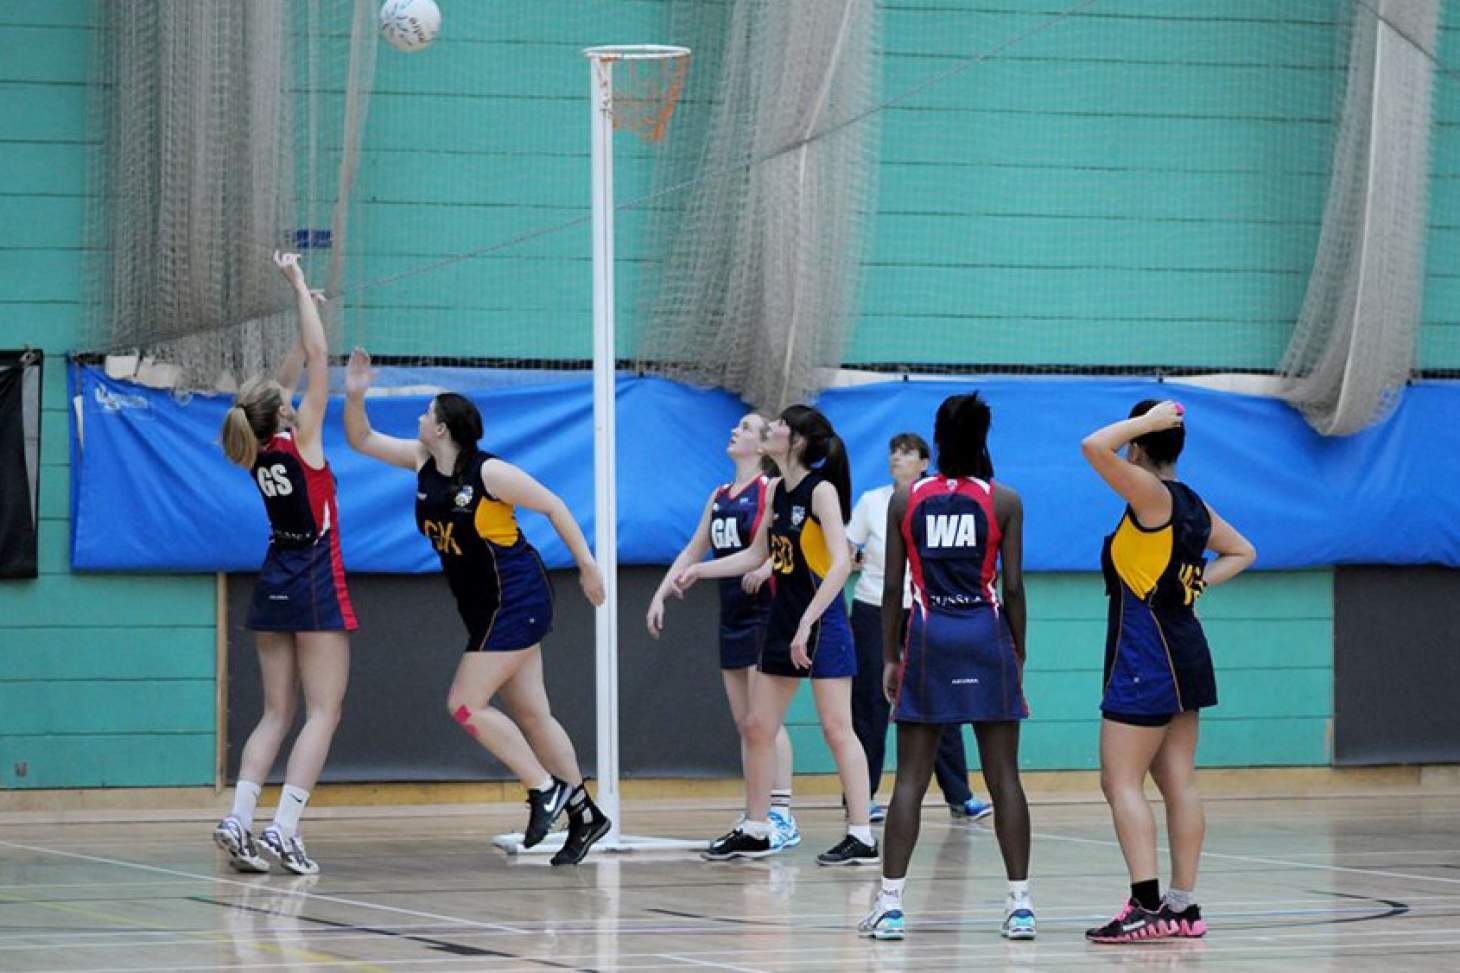 University Of Sussex Sport Centre Indoor netball court